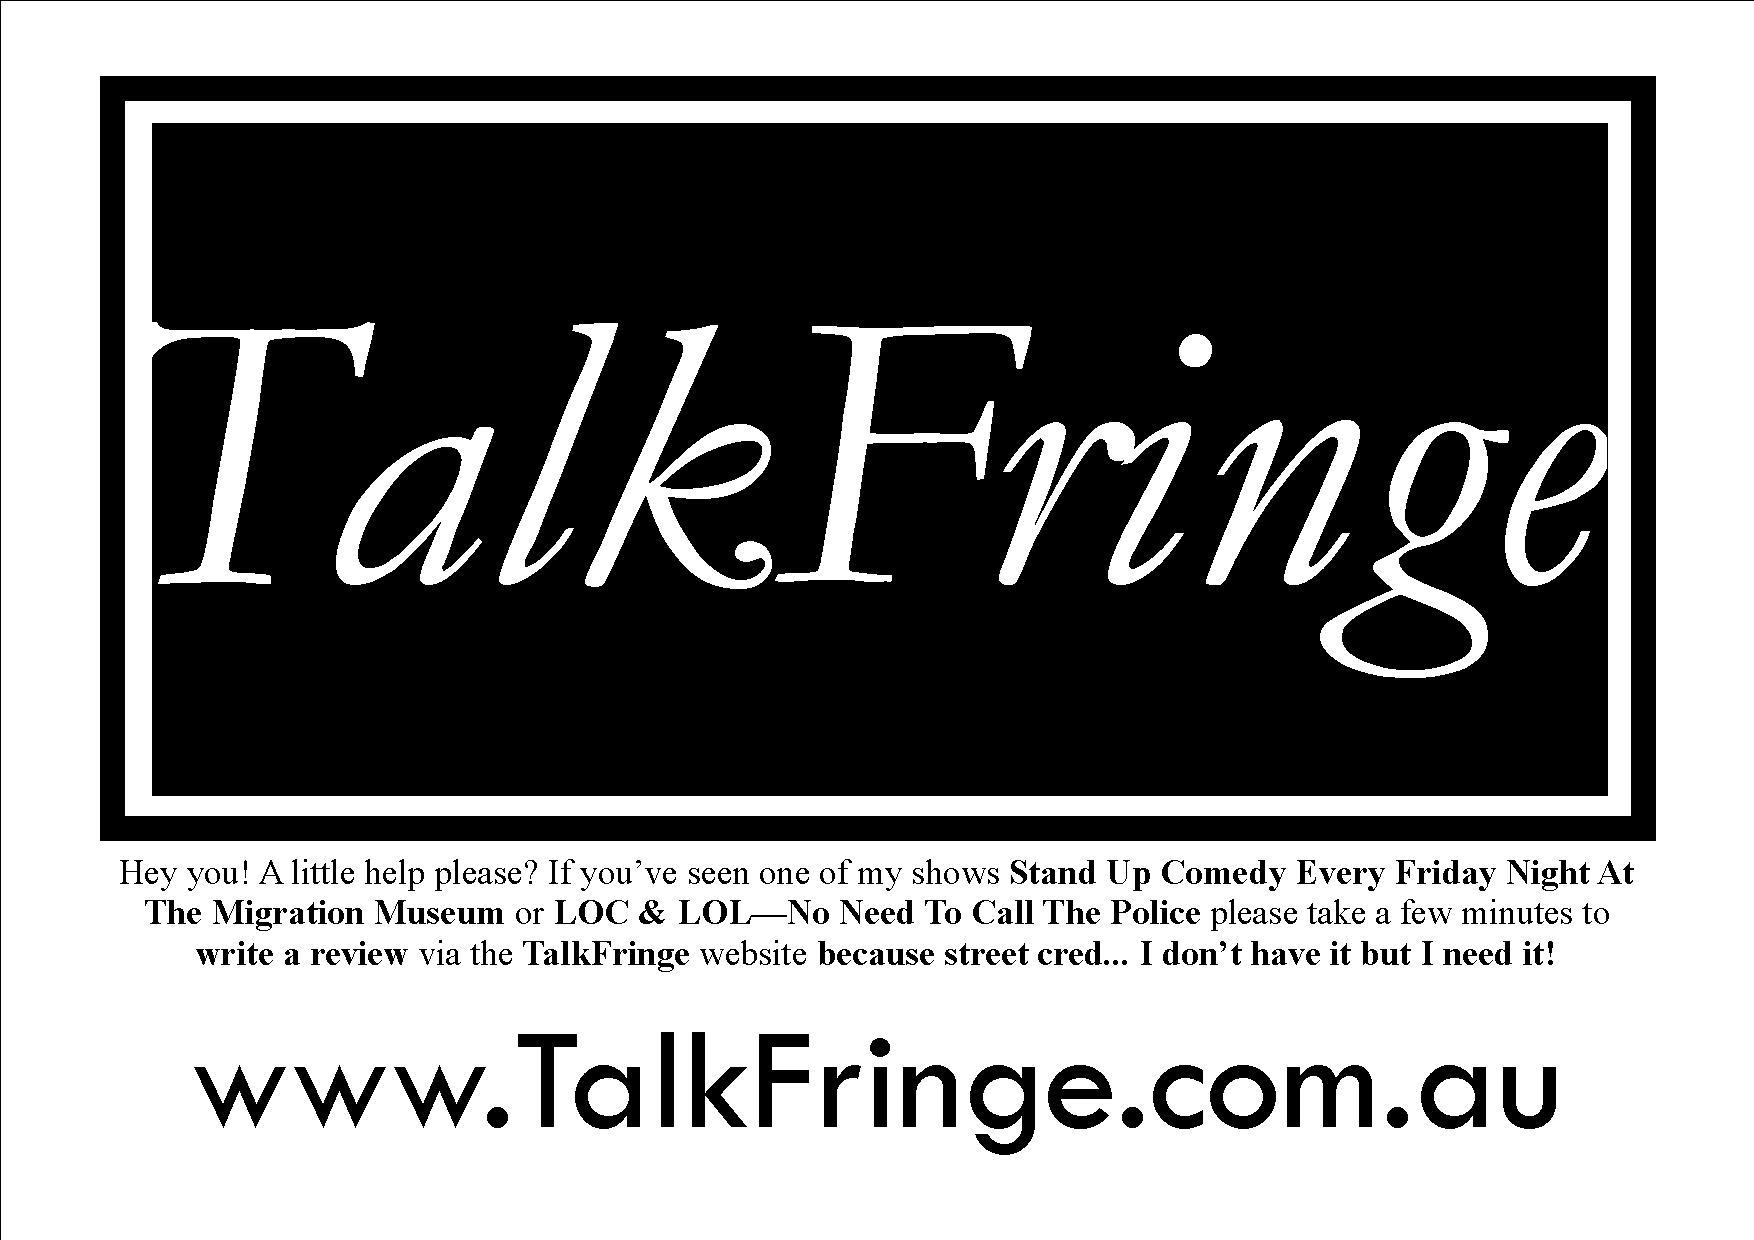 Talk Fringe